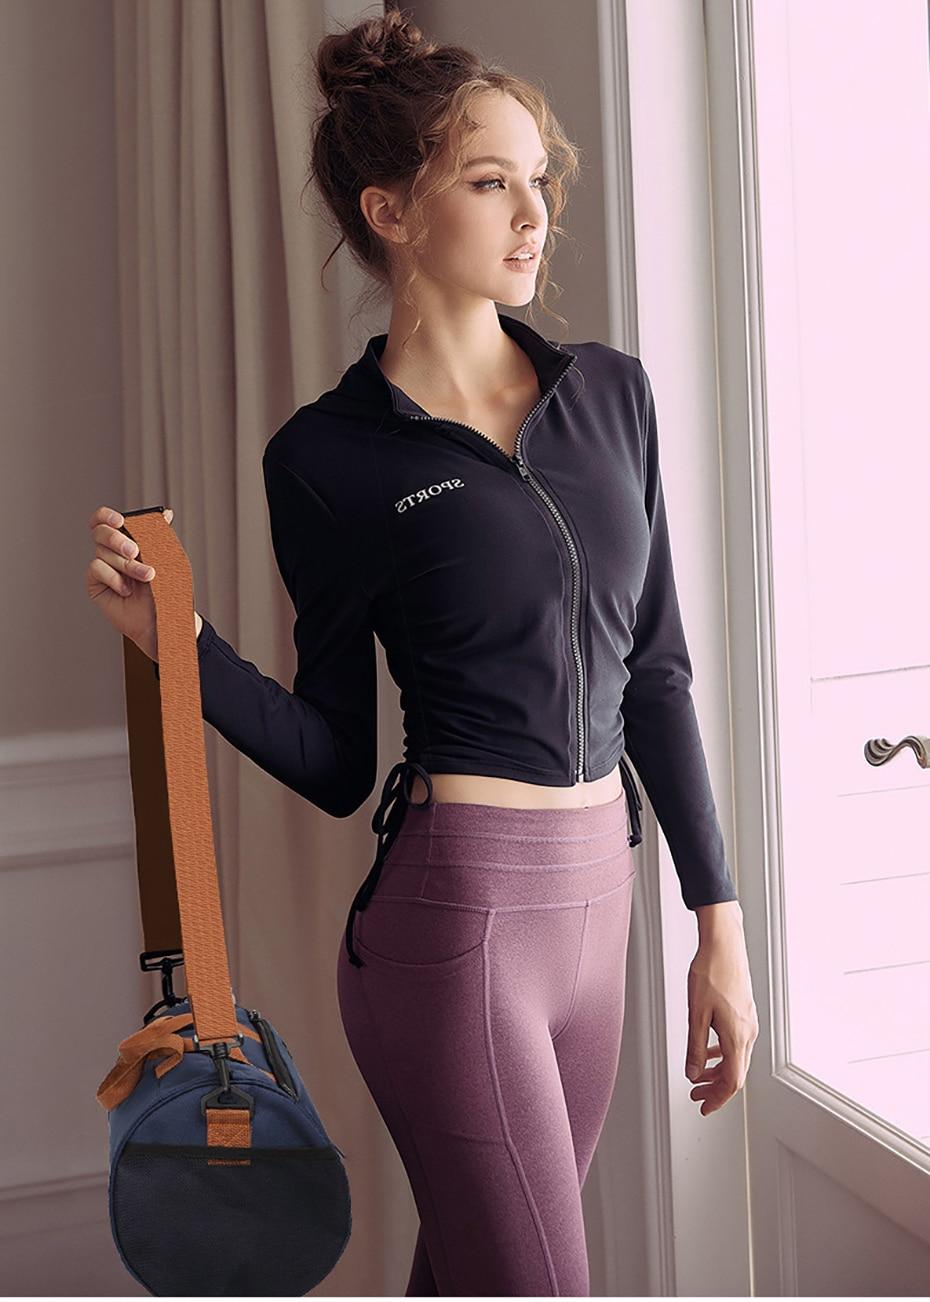 Outdoor Sports Gym Bag Multifunction Training Fitness Shoulder Bag With Shoes Pocket Travel Yoga Handbag Dry wet Swimming Bag0109